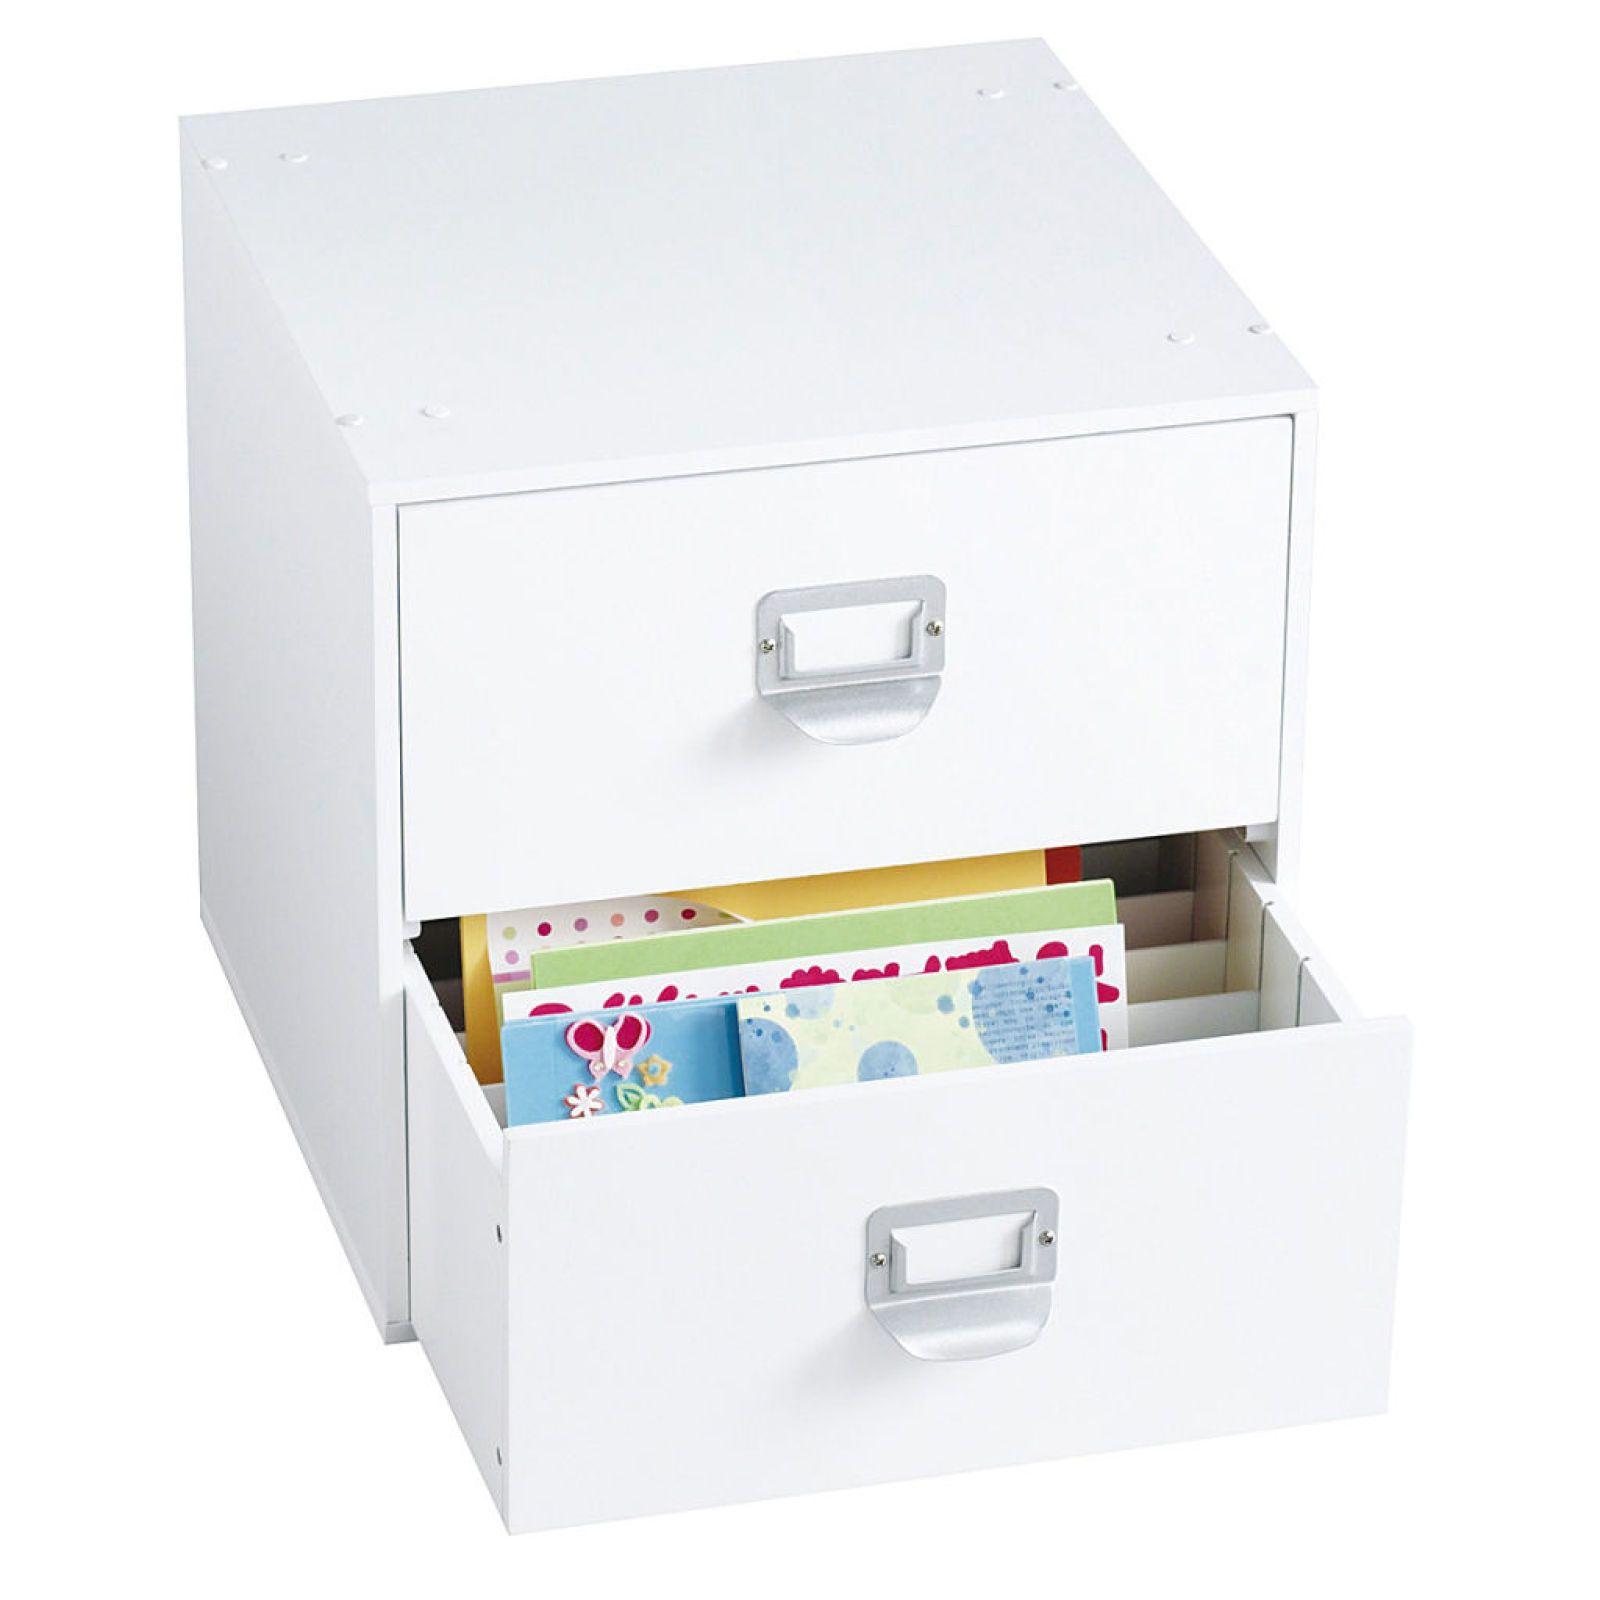 2 Drawer Cube By Ashland Craft Storage Solutions Craft Organization Craft Room Storage